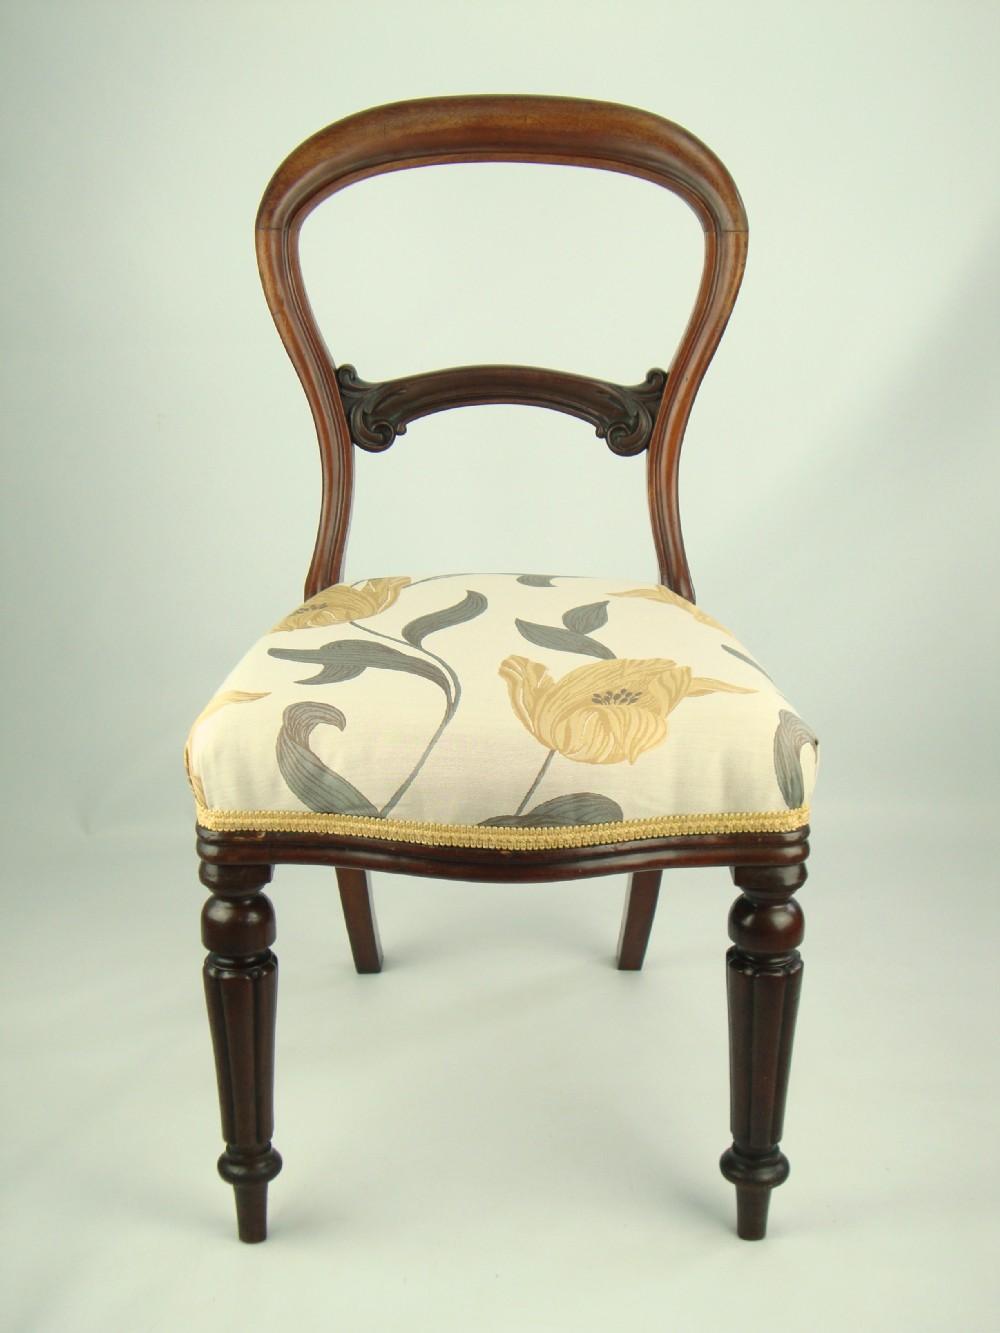 Antique Victorian Balloon Back Chair 234494